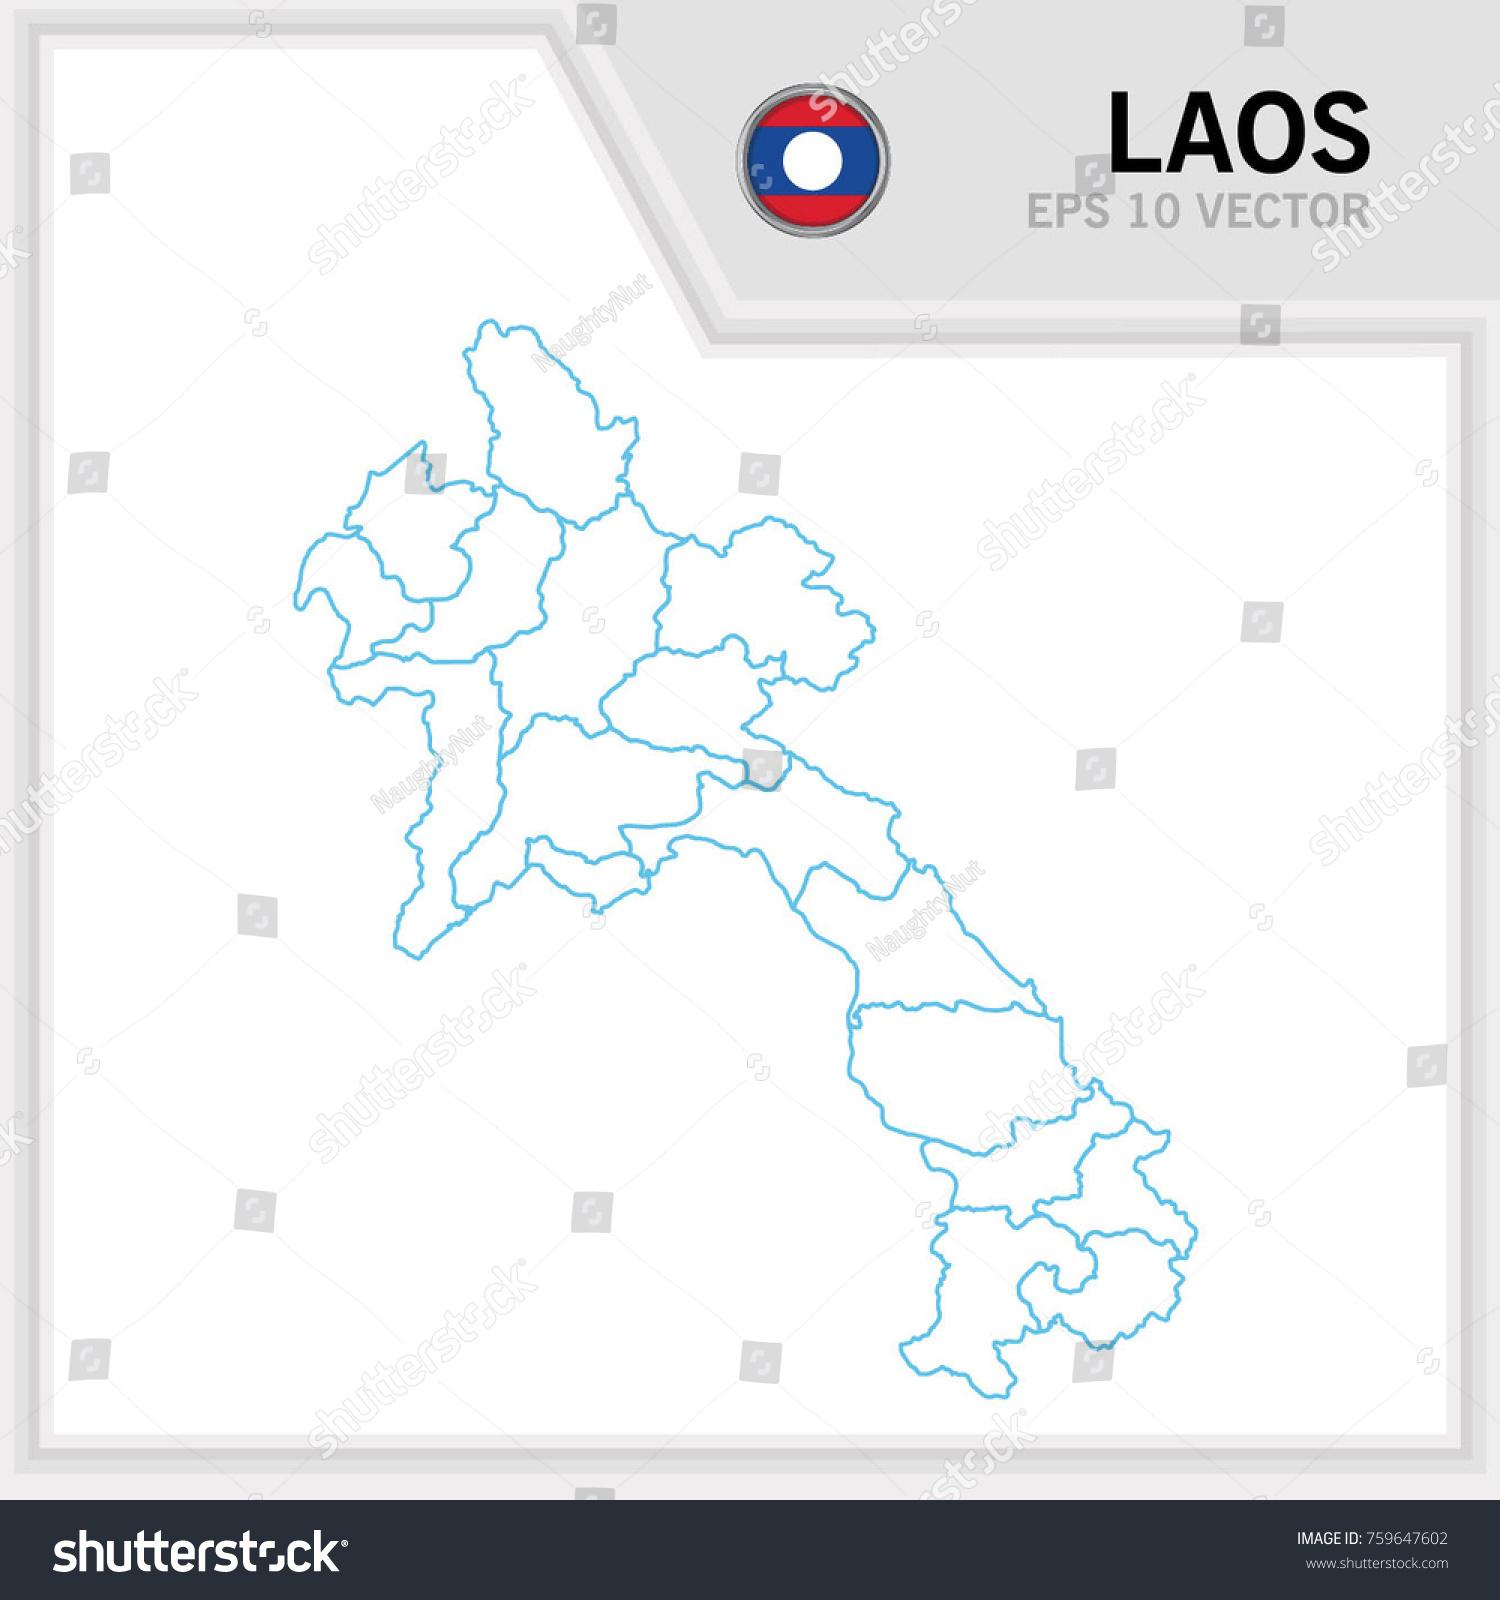 Laos Map Stock Vector Image Robert H Treman State Park Map - Laos map vector